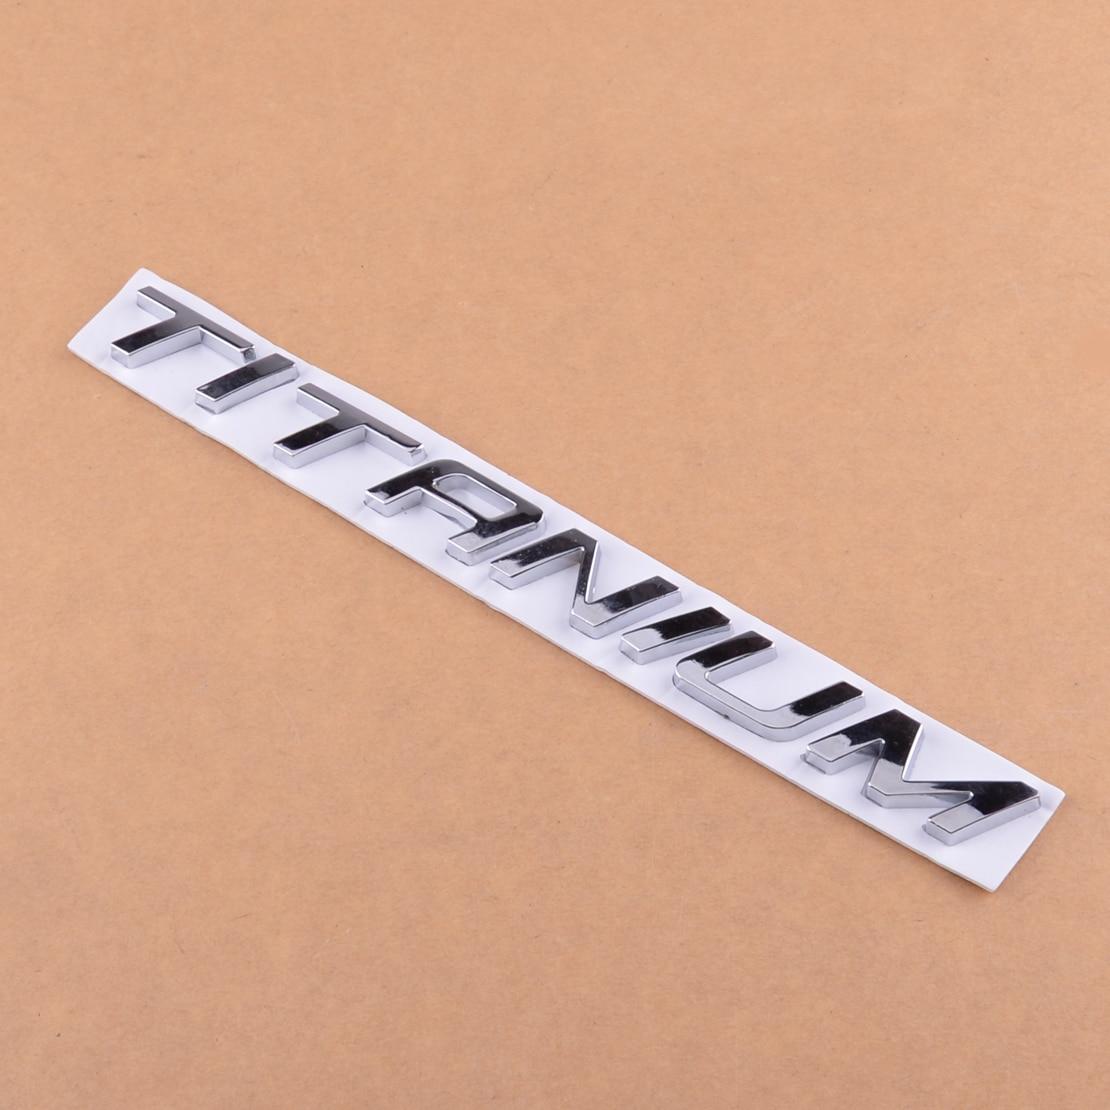 DWCX Universal coche tronco cromo insignia calcomanía emblema letras pegatina titanio apto para Ford Mondeo Kuga